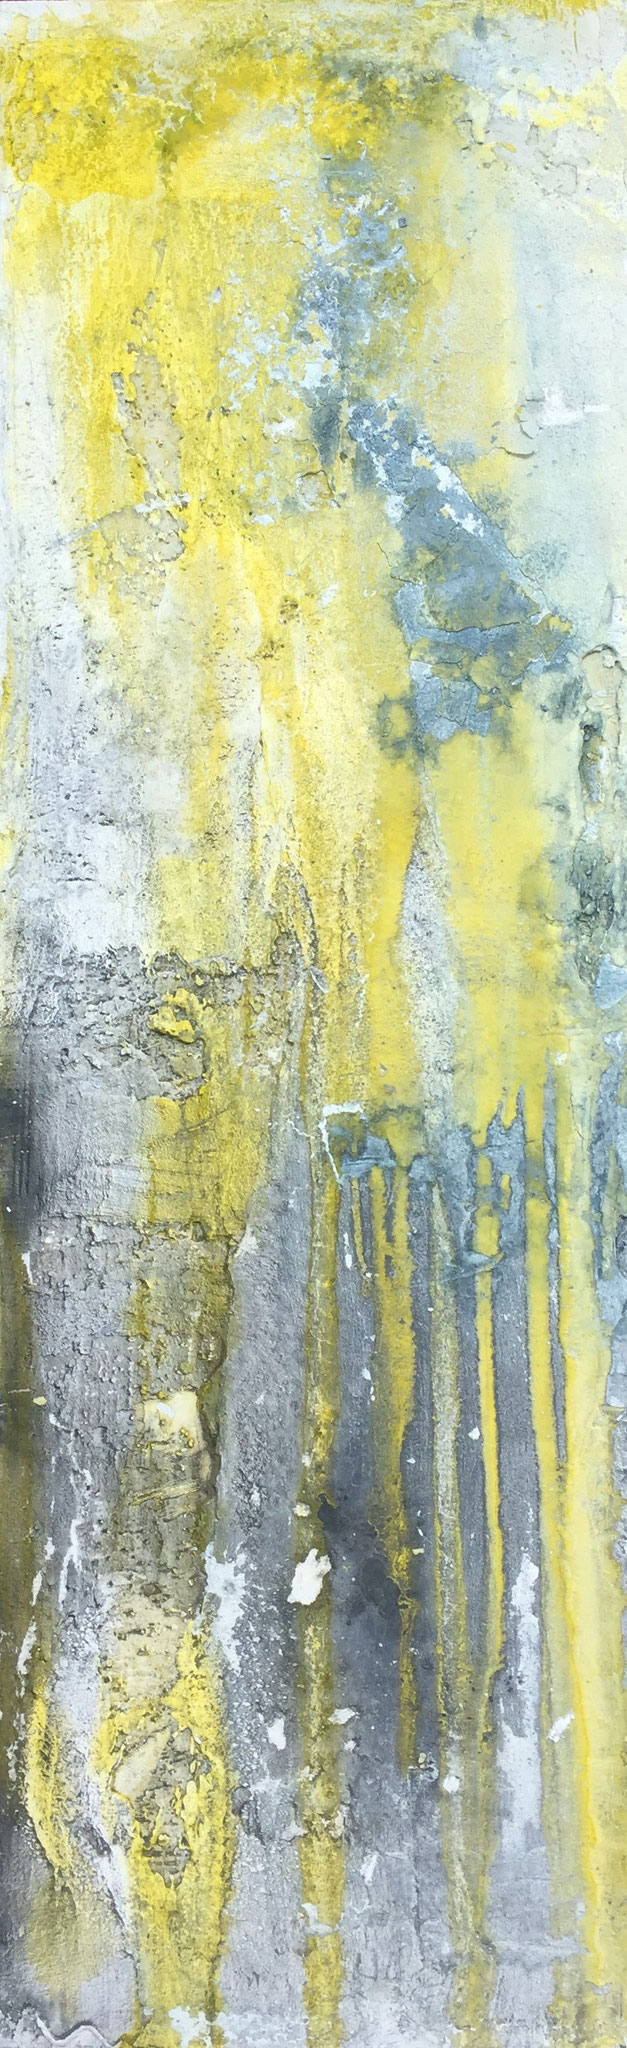 Grau gegen Gelb, 90x30x4cm